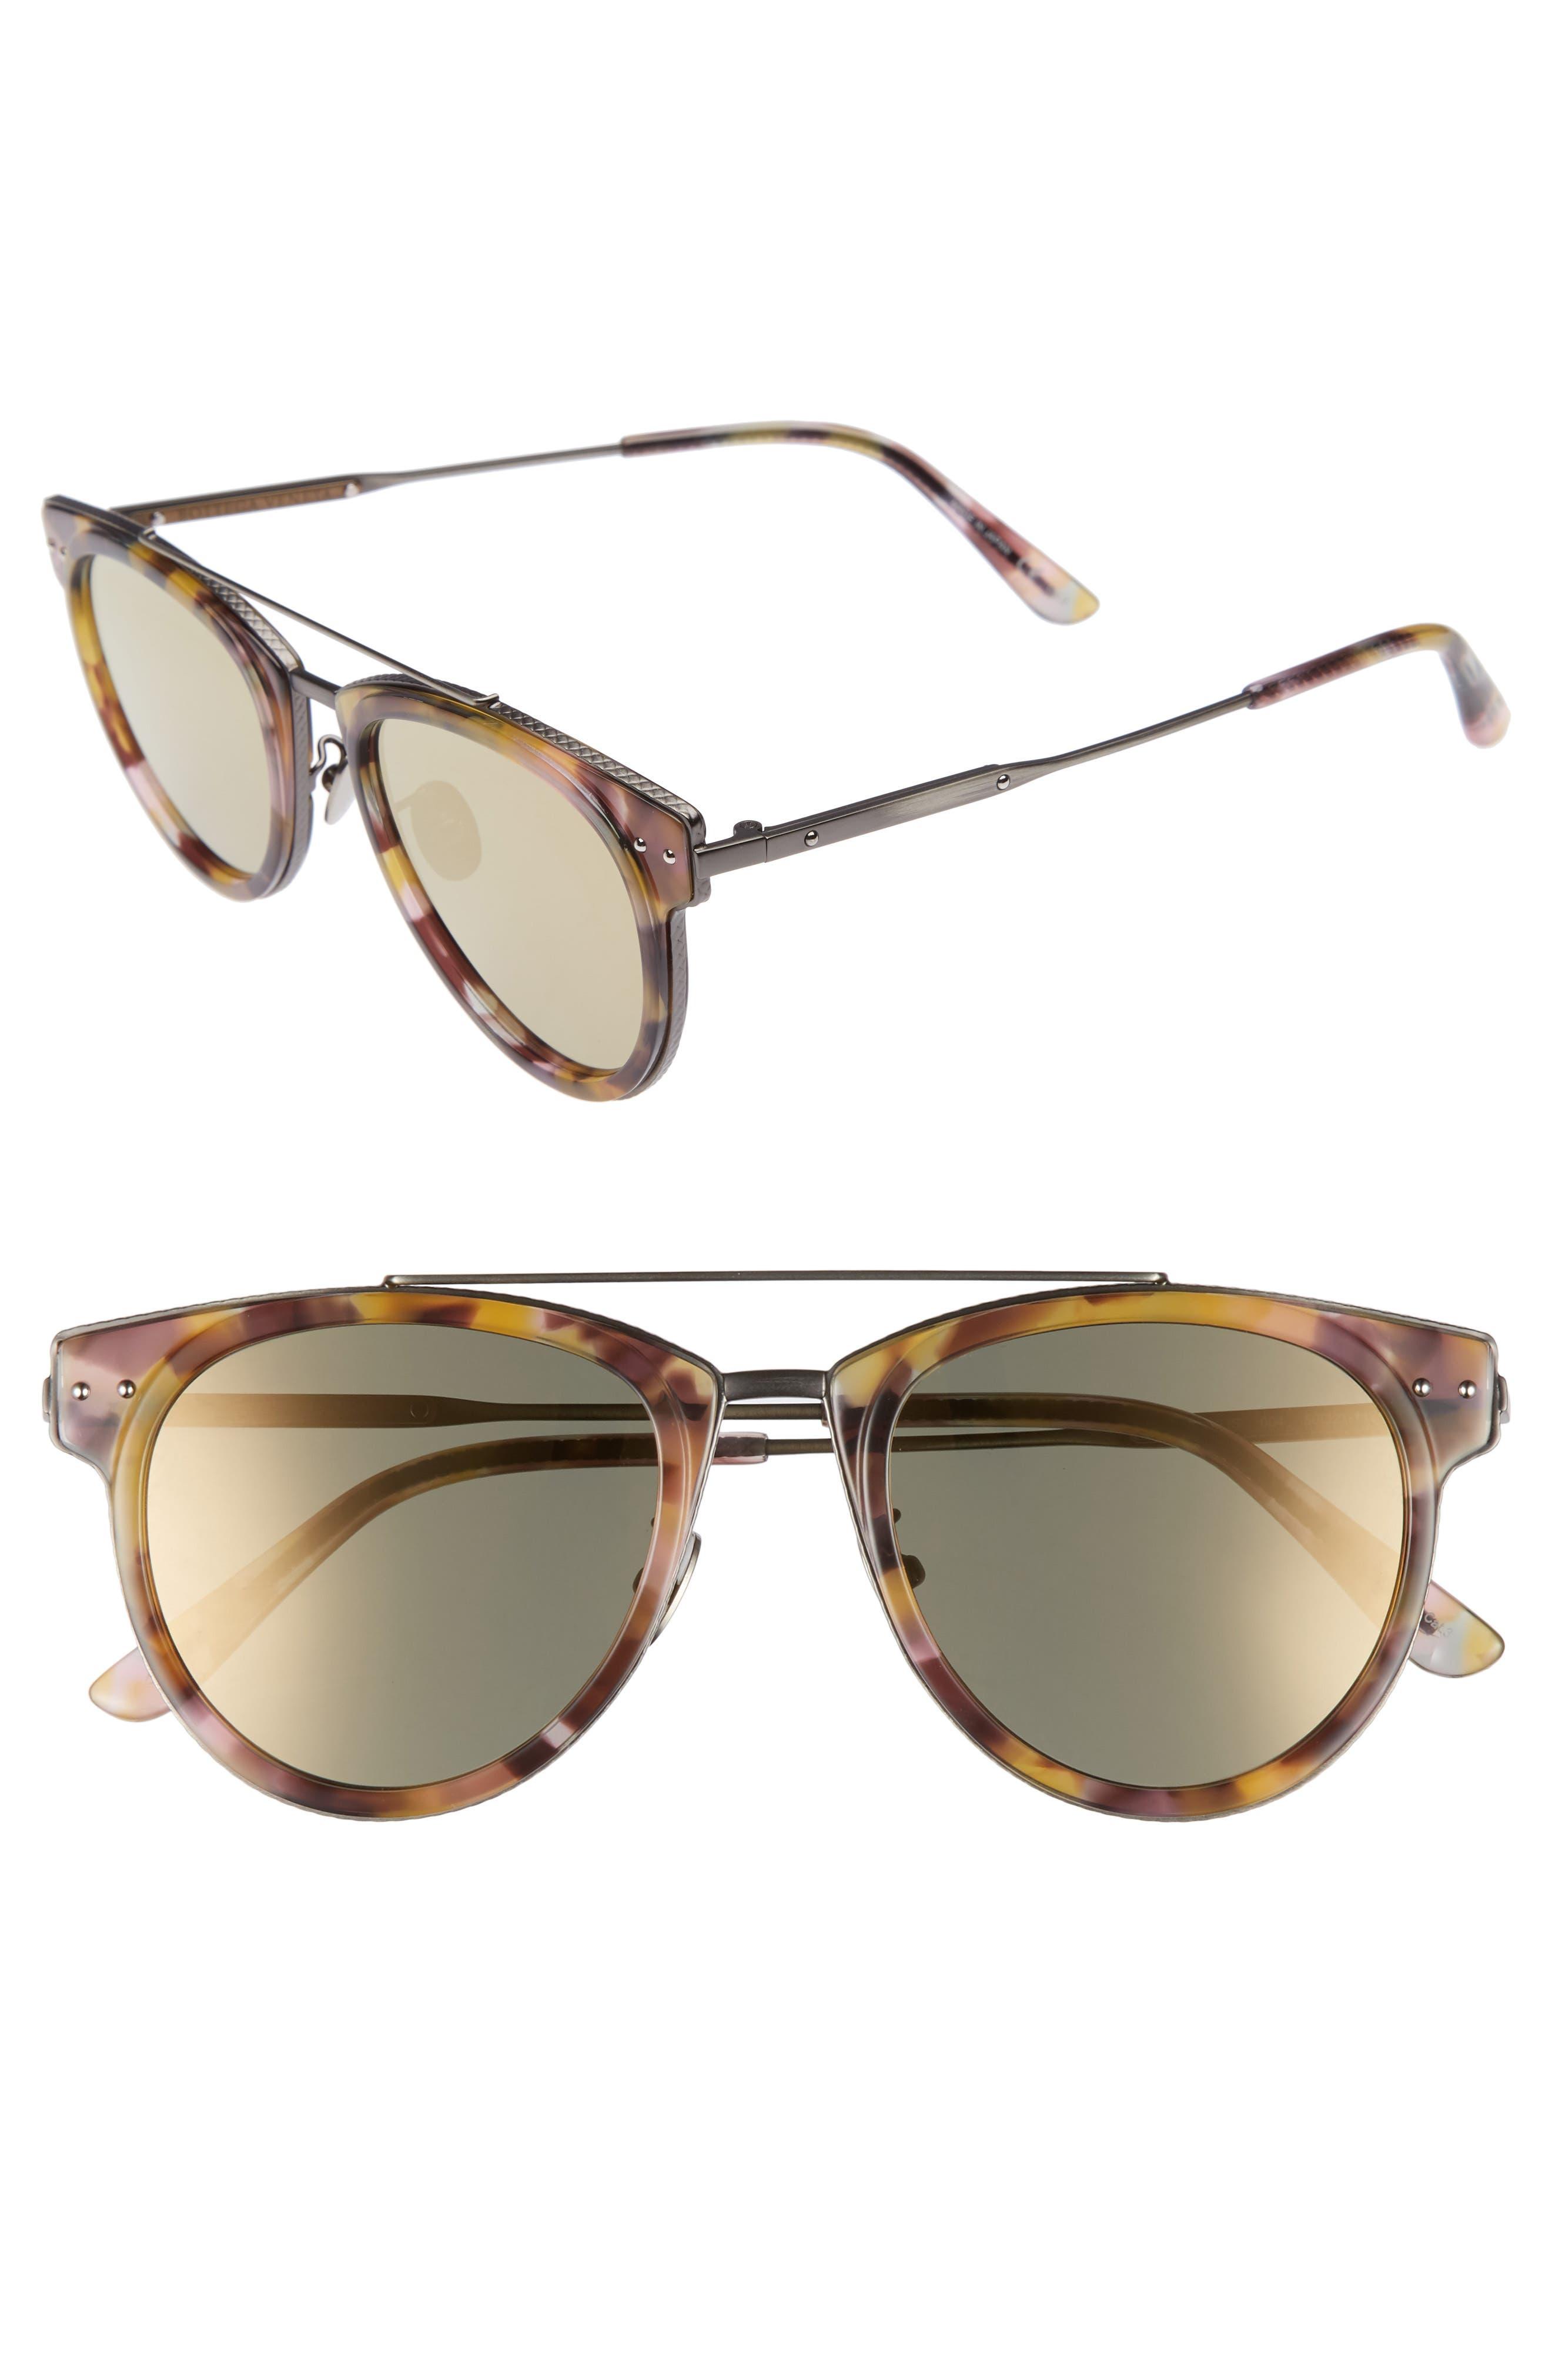 Main Image - Bottega Veneta 50mm Sunglasses